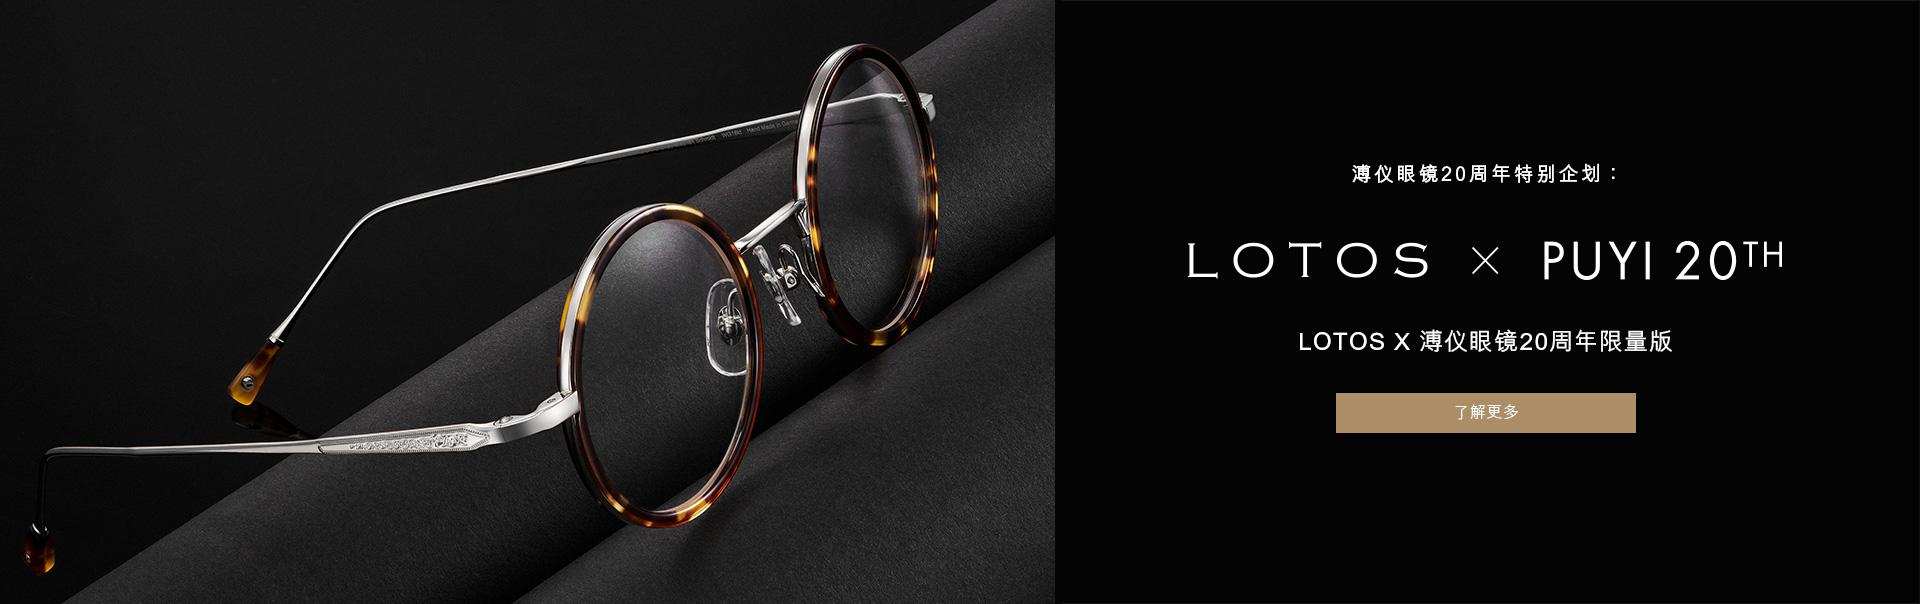 LOTOS X 溥仪眼镜20周年专属纪念款